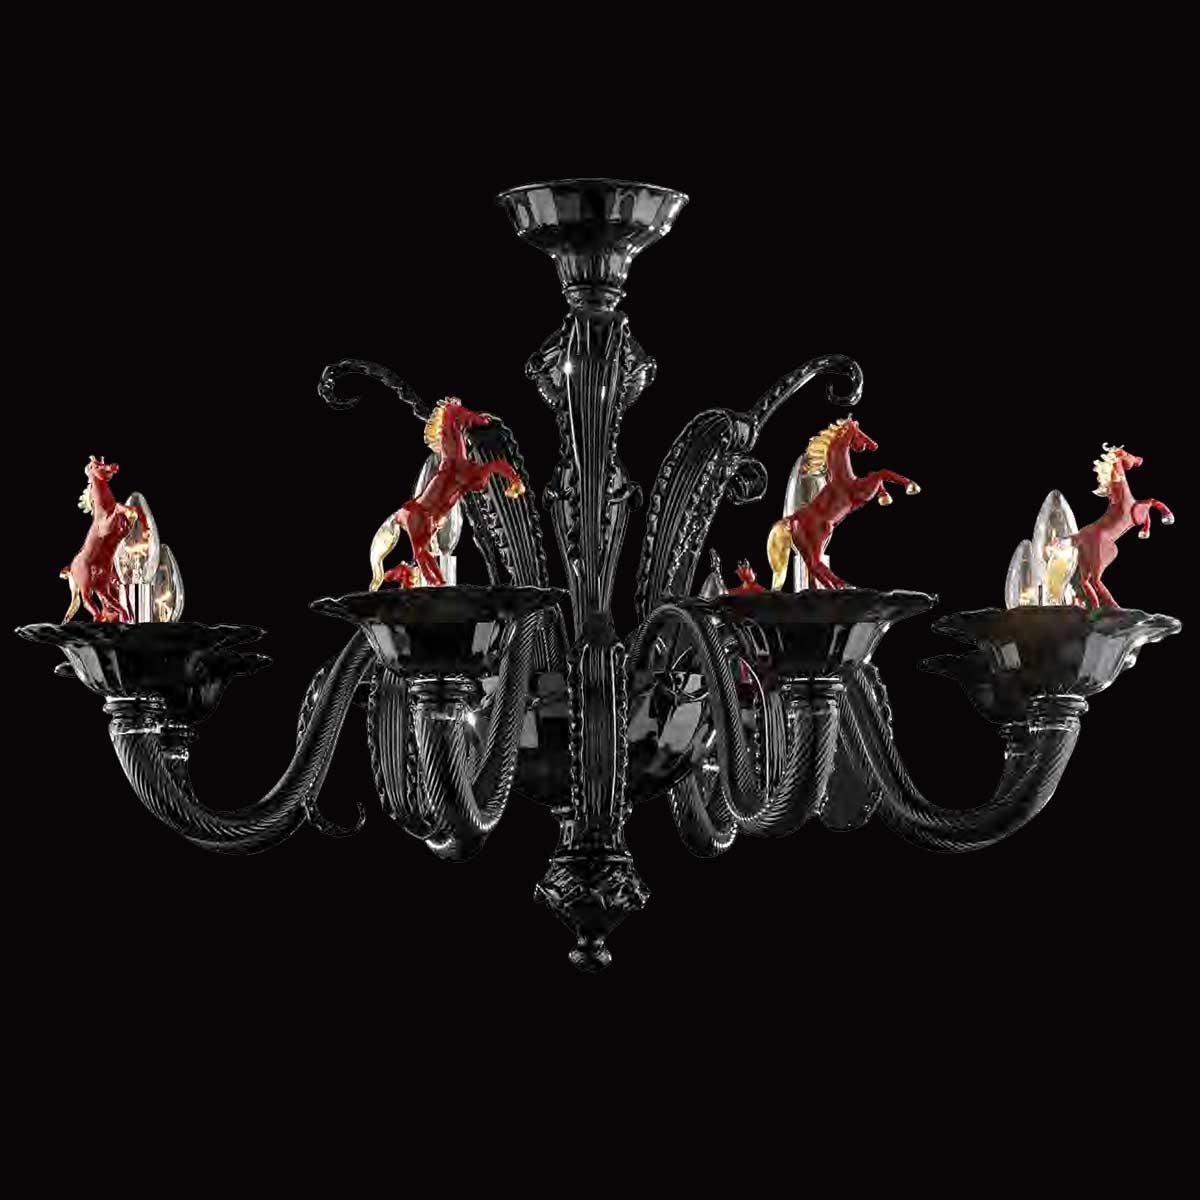 """Cavallino"" Murano glass chandelier - 8 lights - black and red"